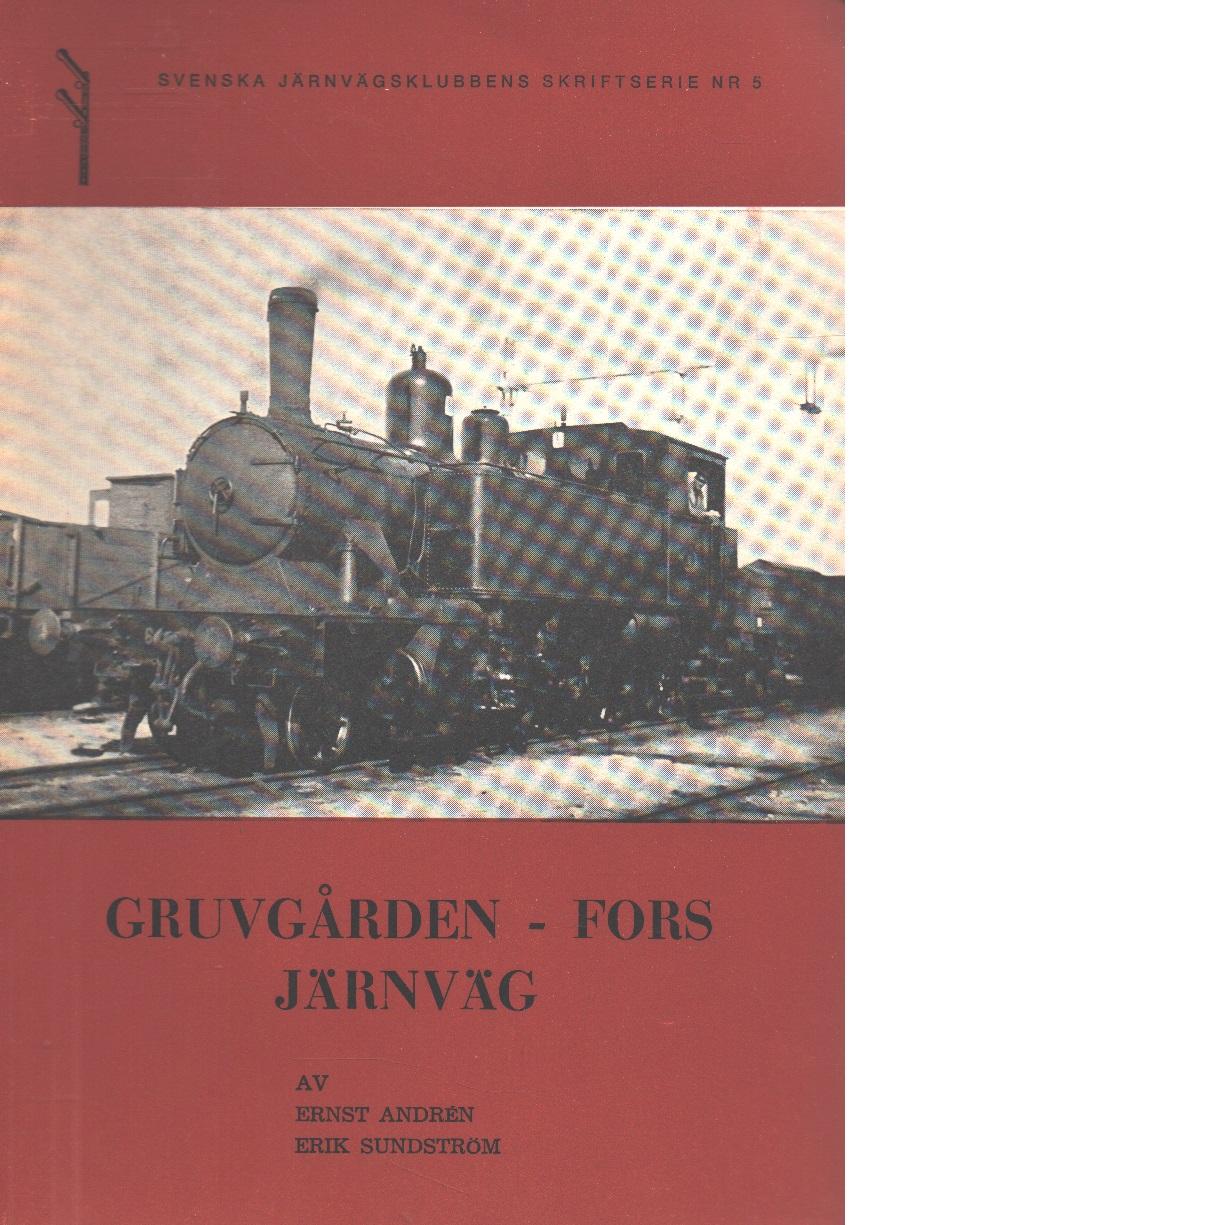 Gruvgården - Fors järnväg - Andrén, Ernst Och Sundström, Erik